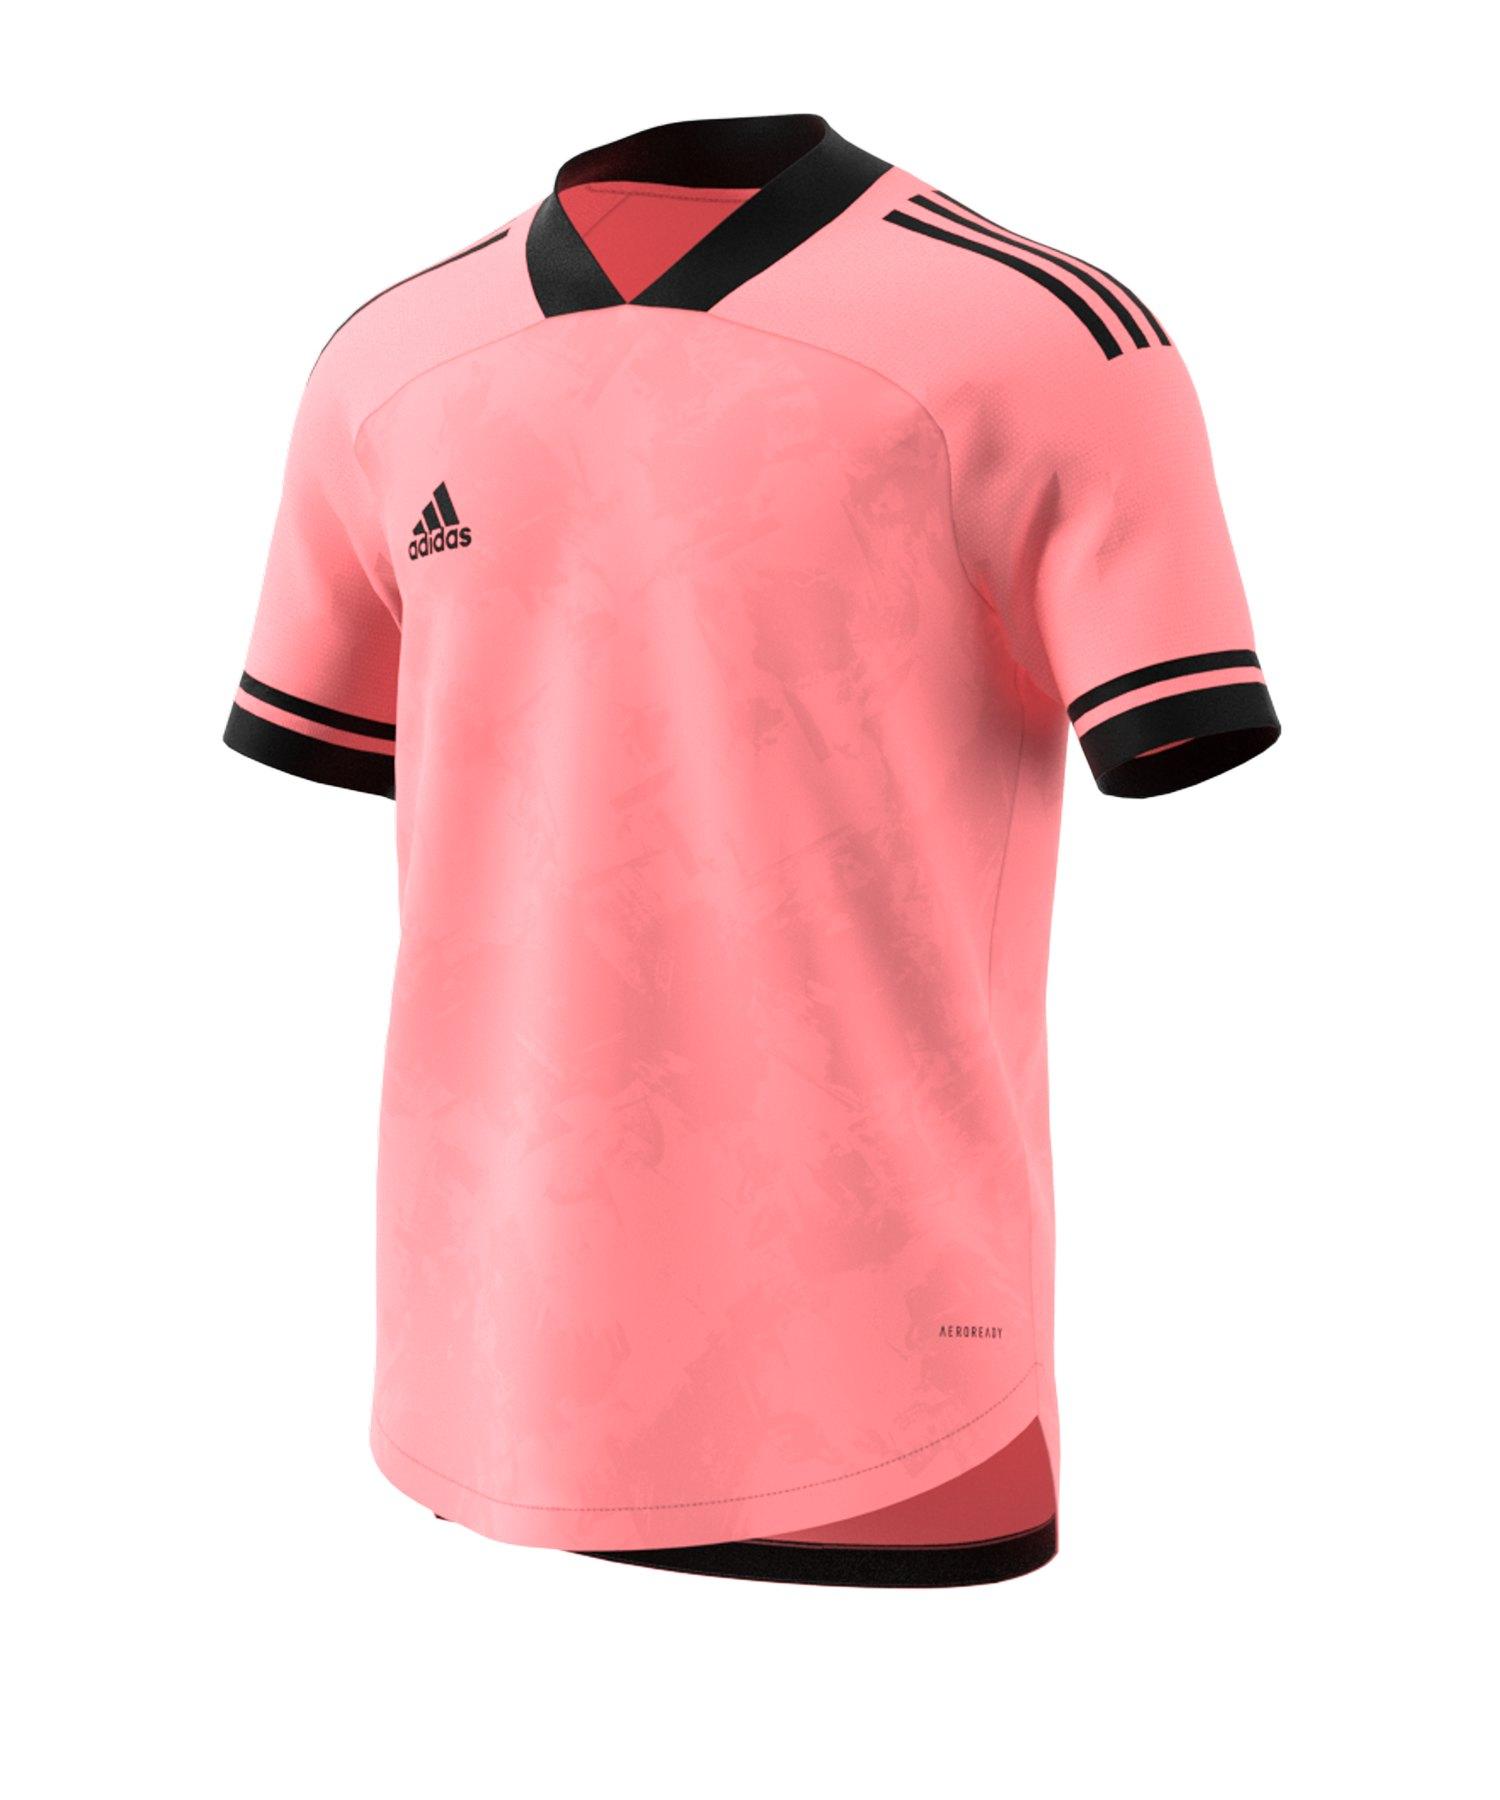 adidas Condivo 20 Trikot kurzarm Pink Schwarz - pink